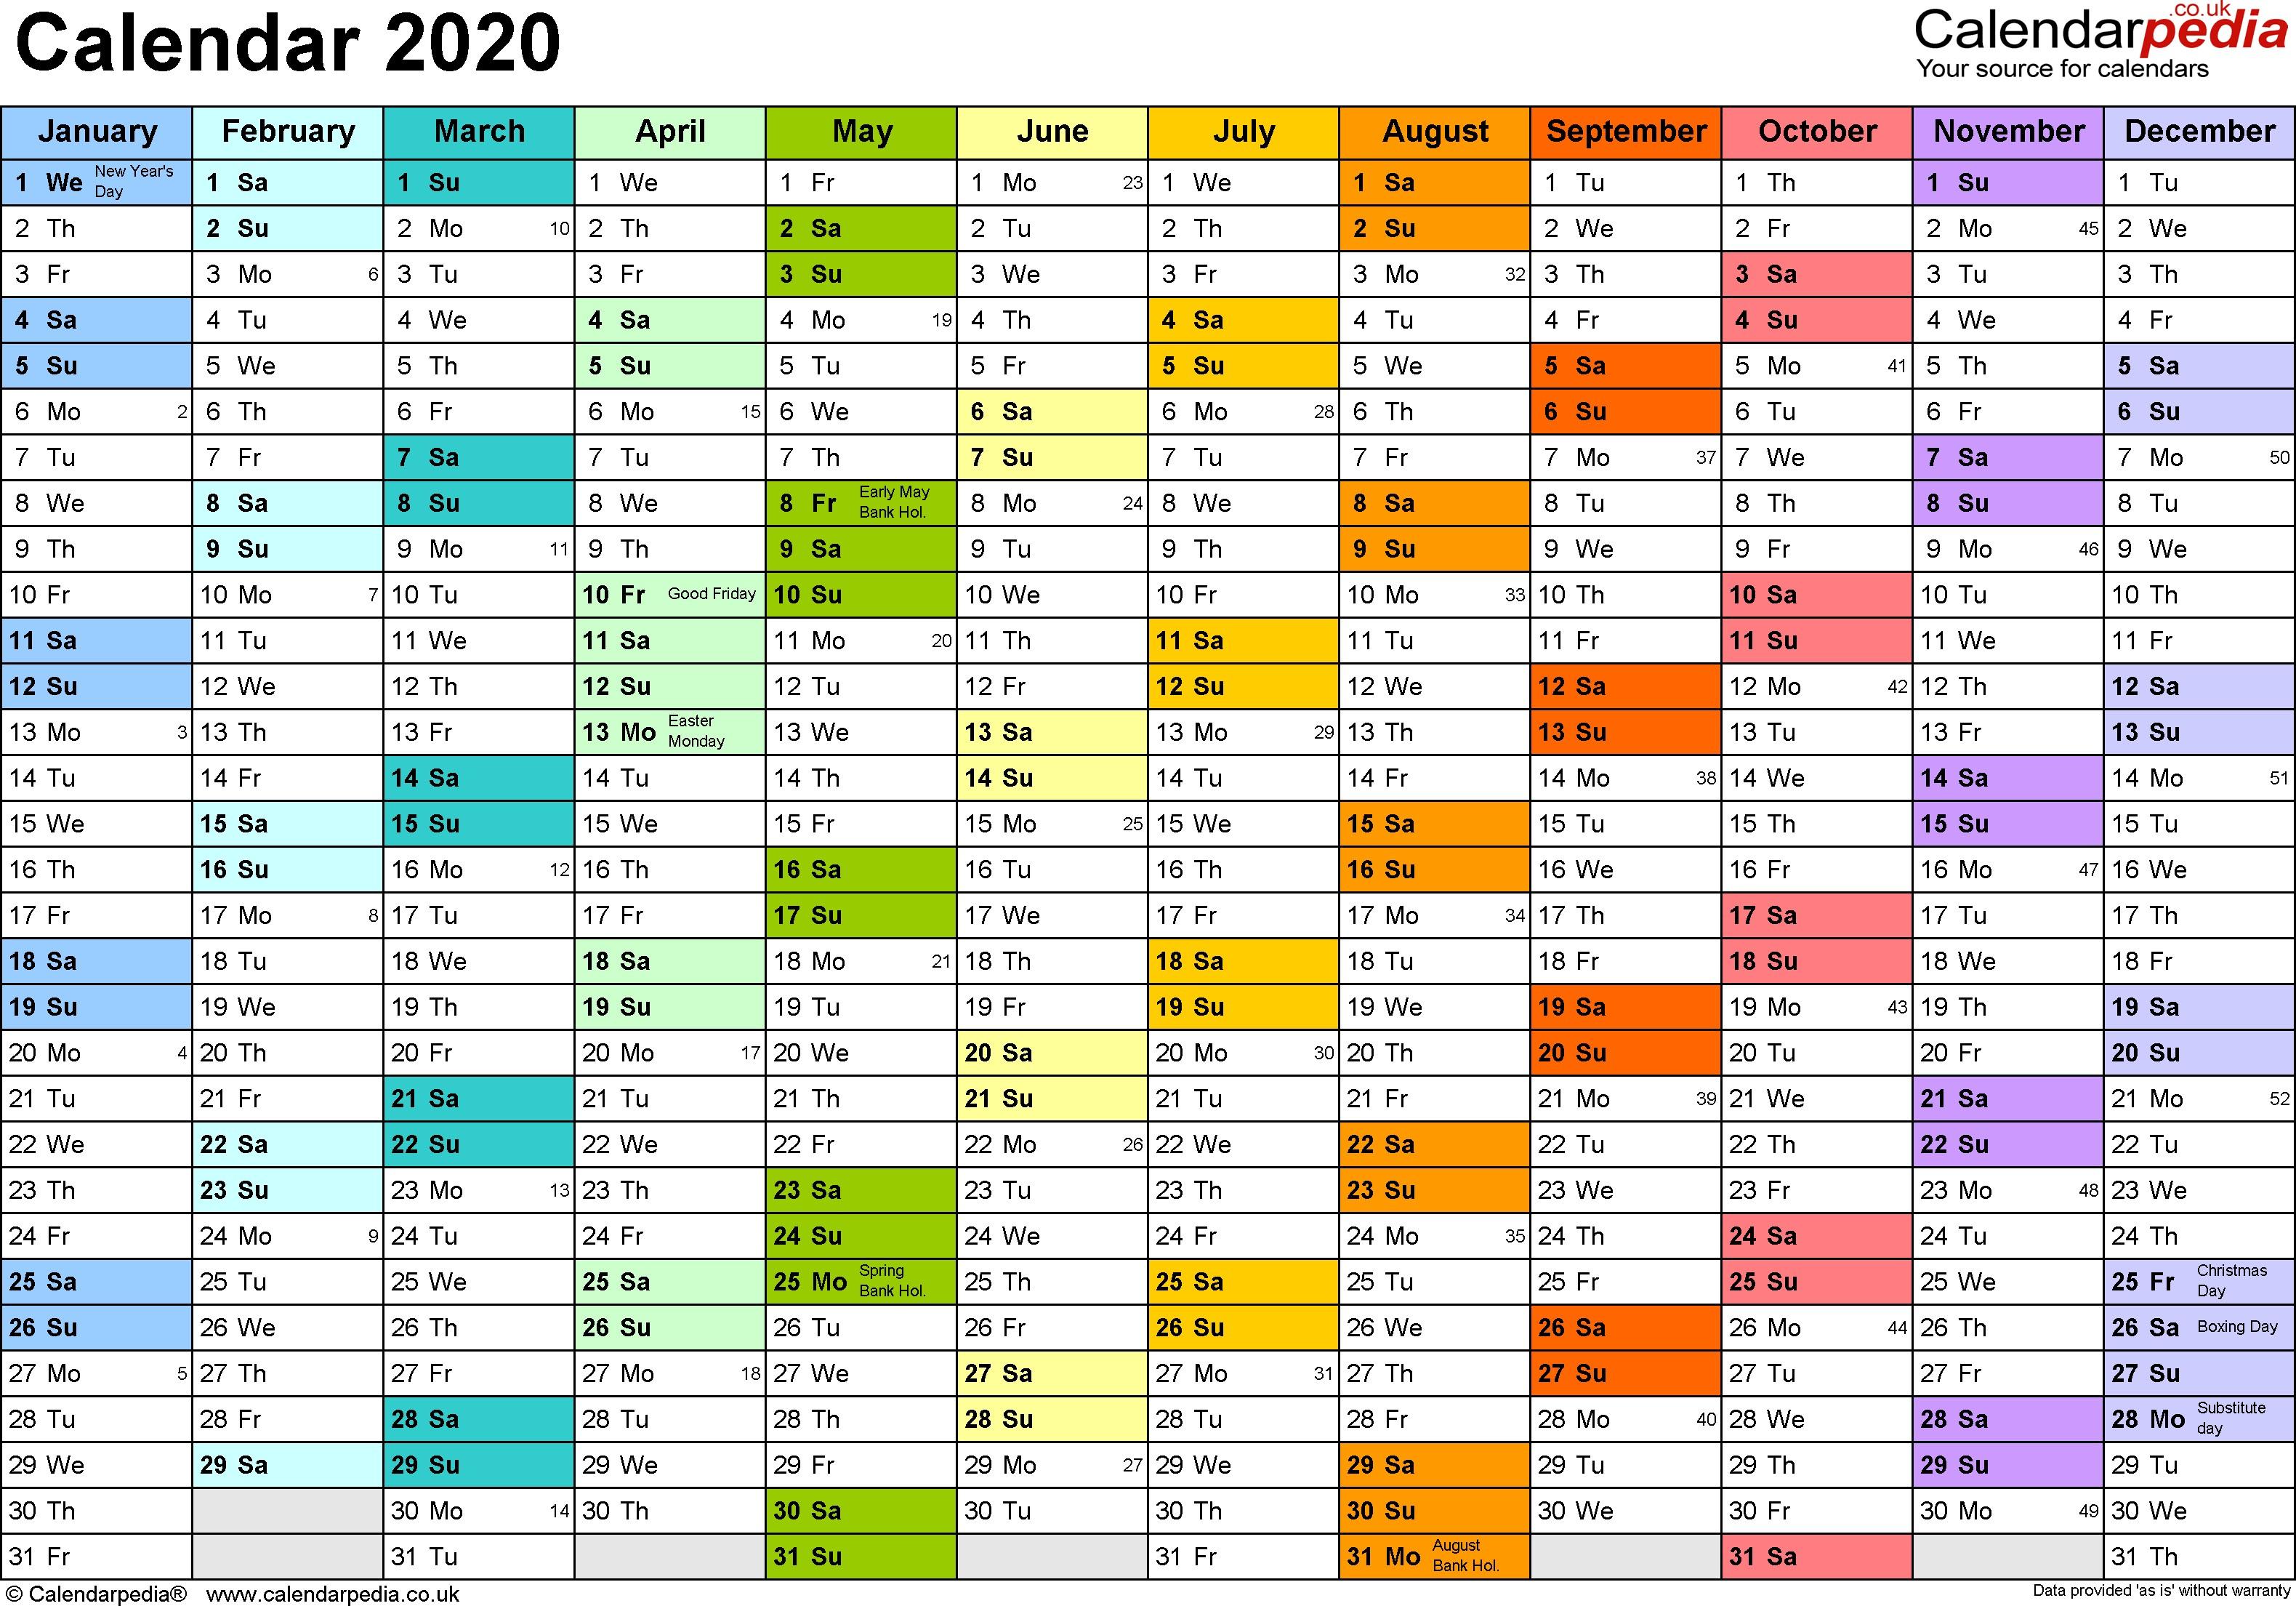 Calendar 2020 Printable Uk Calendar 2020 Uk 16 Free Printable Pdf Templates